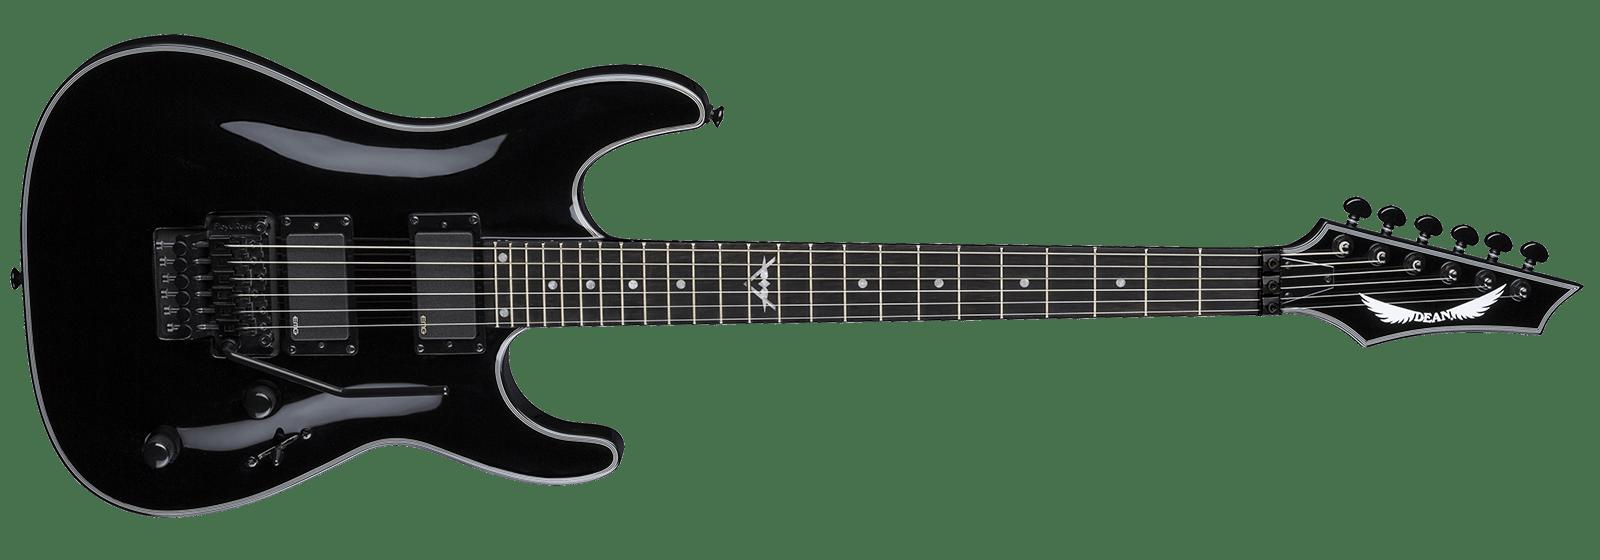 1600x560 Black Electric Guitars